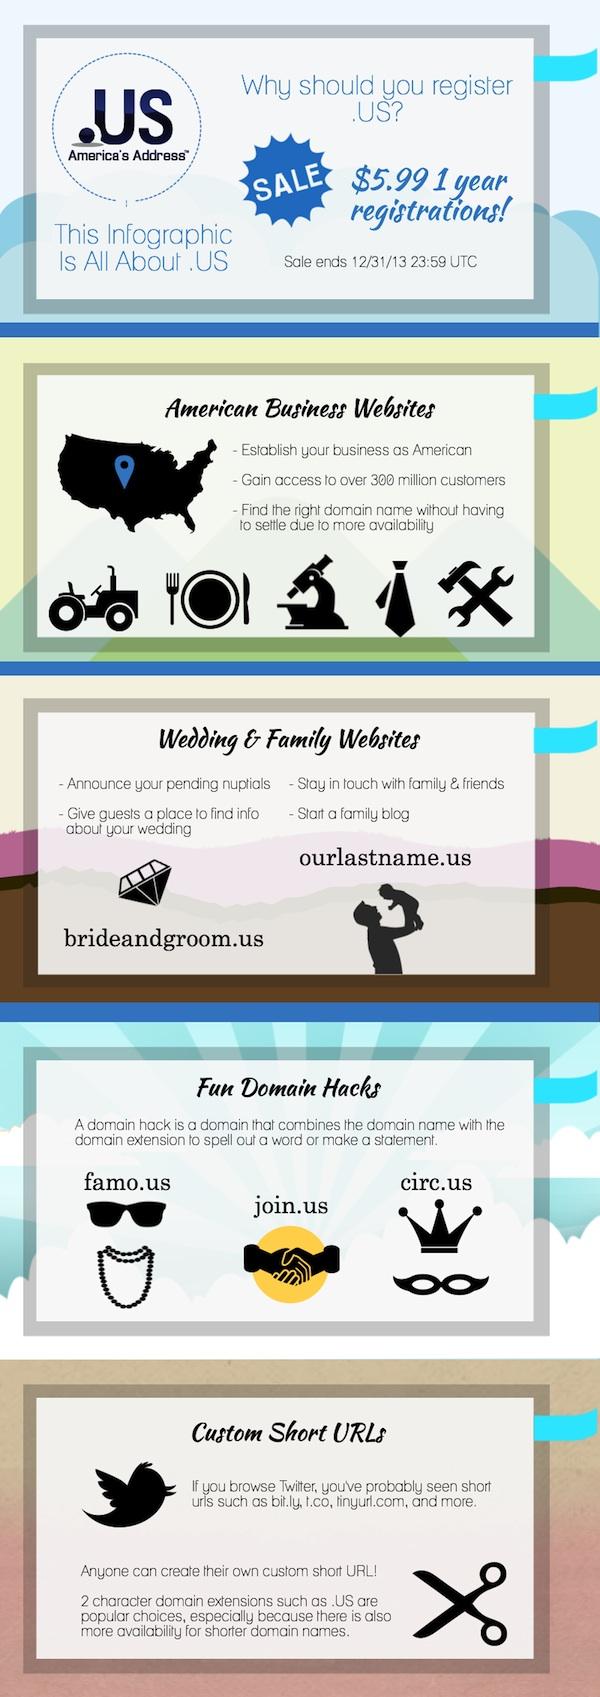 .US Domain Sale Infographic: American Business Websites, Wedding and Family Websites, Fun .US Domain Hacks, Custom Short URLs